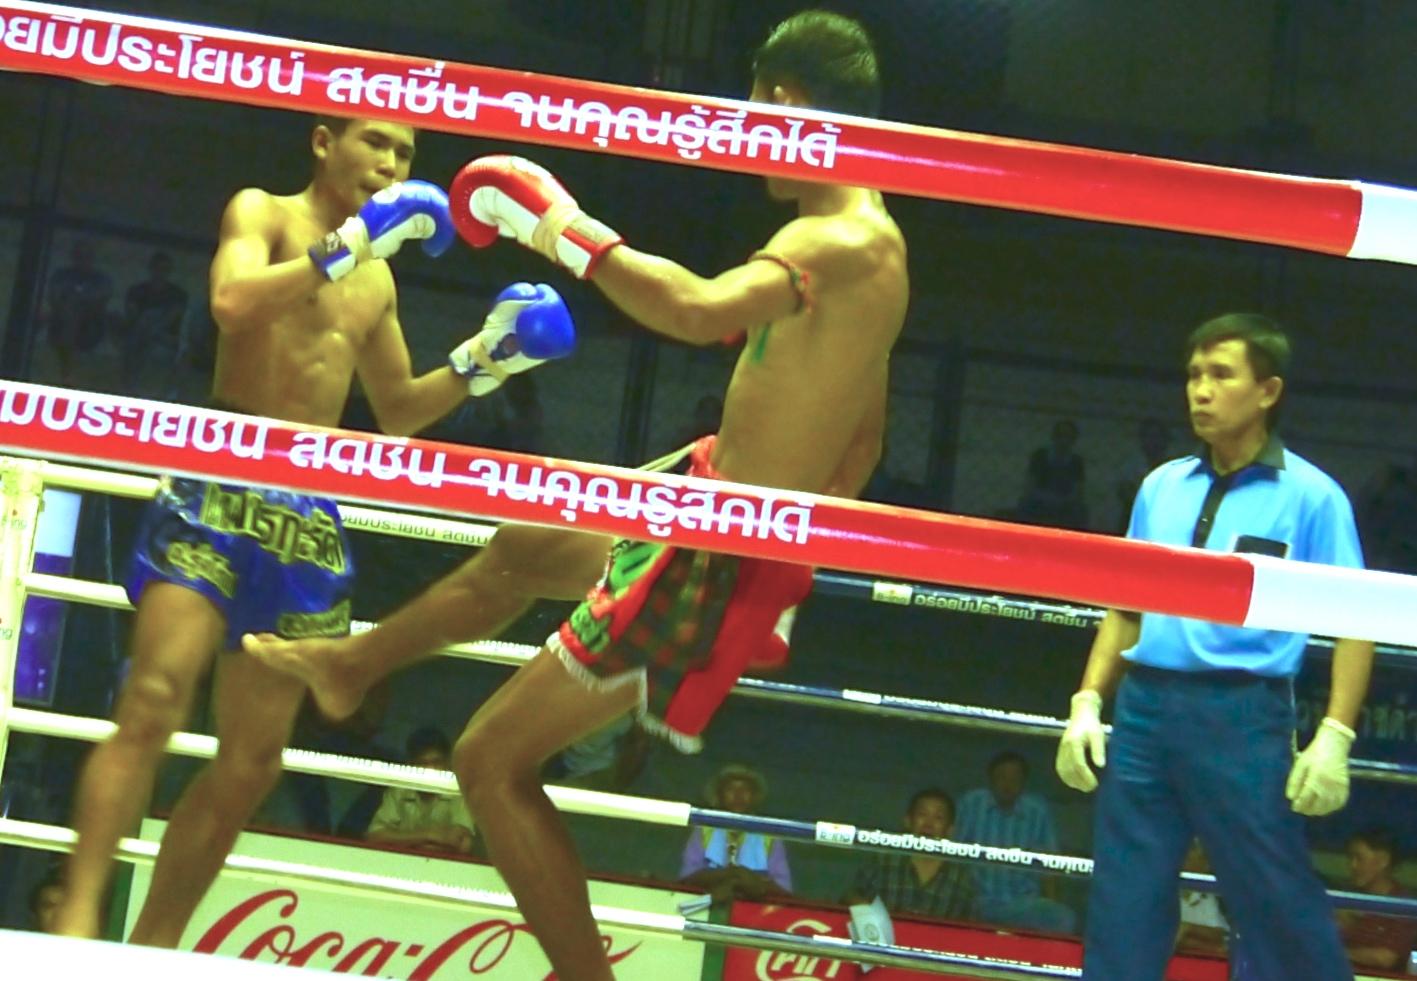 4/Skip overpriced Muay Thai bouts